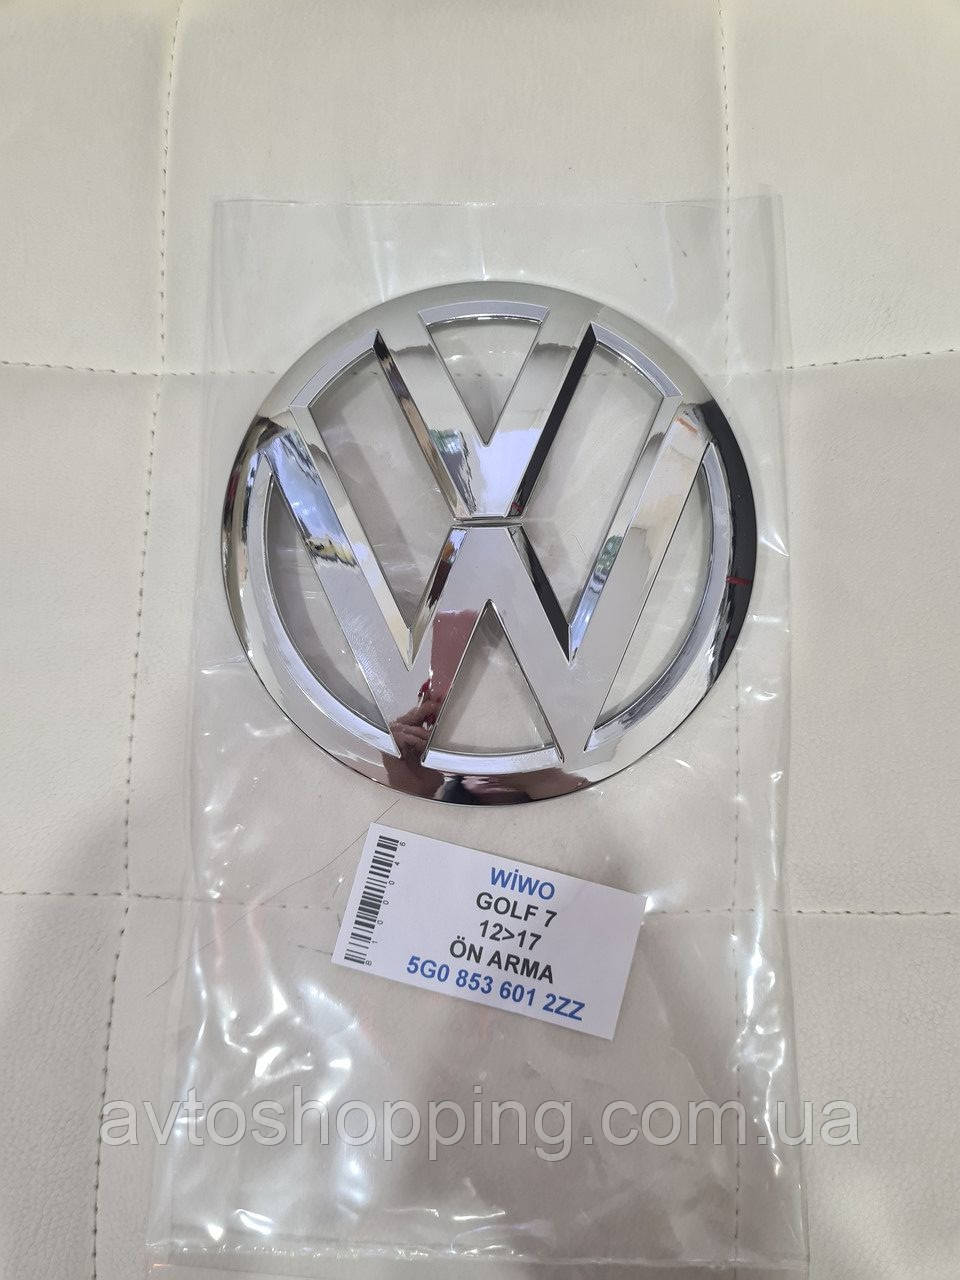 Эмблема значок на решетку радиатора Volkswagen VW GOLF 7 (12-17)  (D=135мм) перед (5G0 853 601 2ZZ)